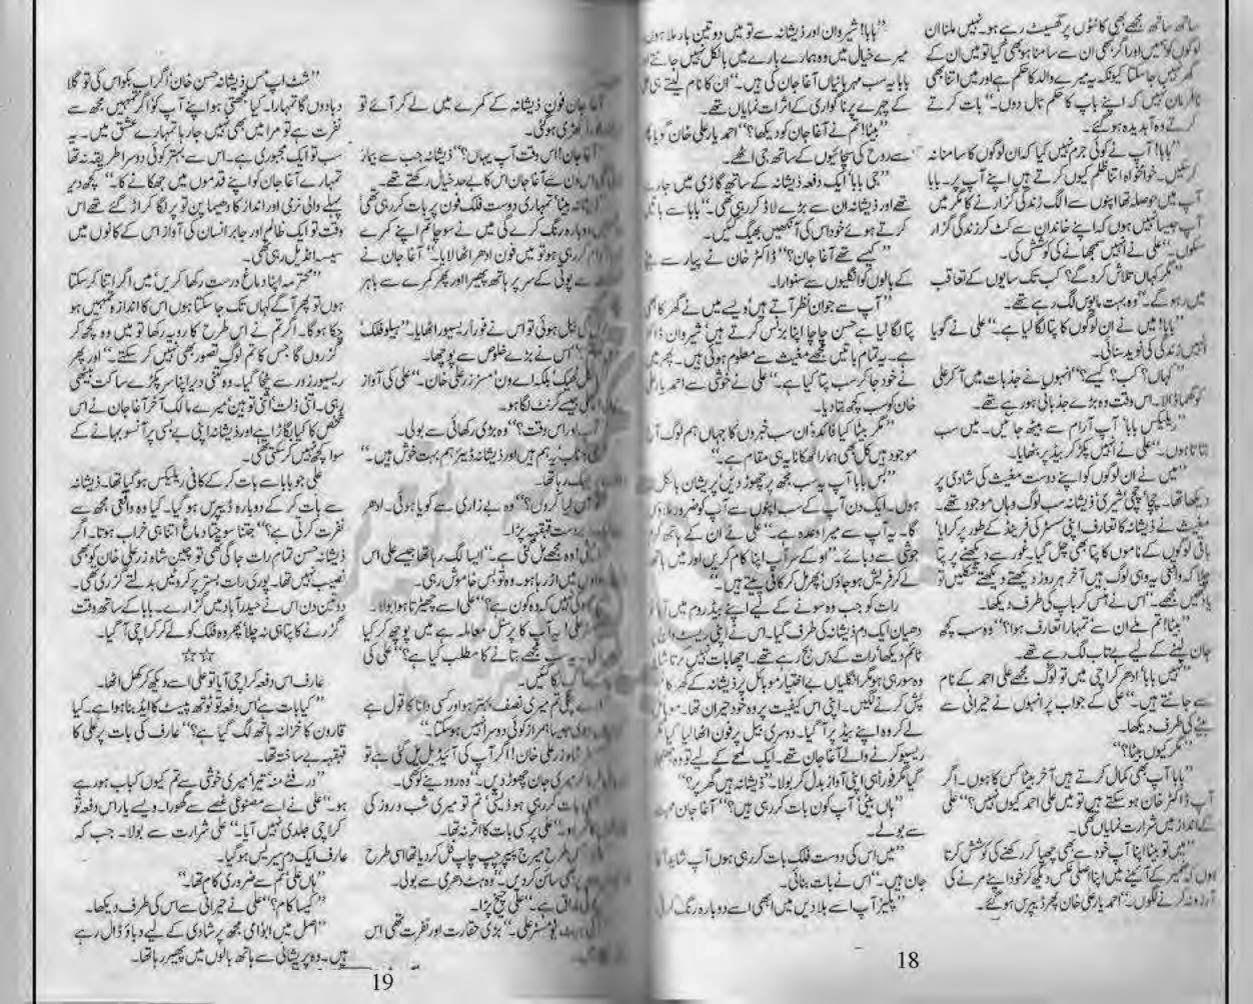 Free Urdu Digests Dil Key Gulshan Se Mohabbat Key Kanwal